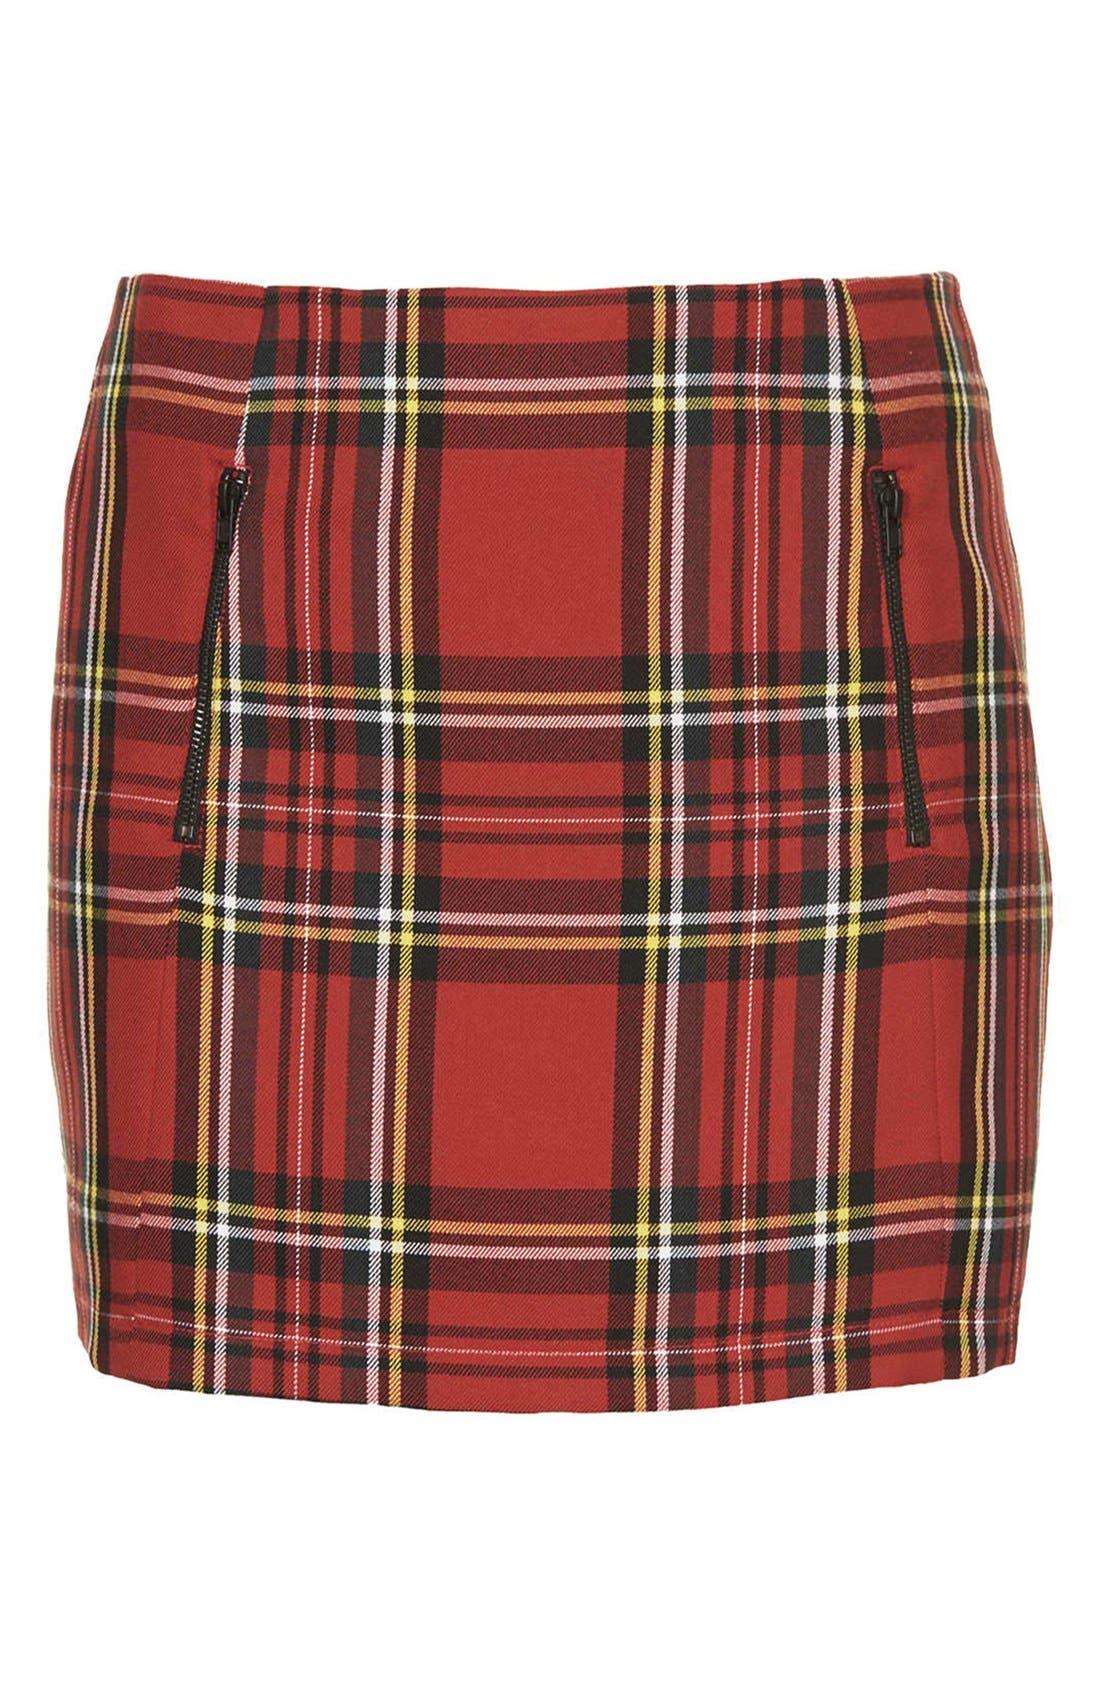 TOPSHOP, Tartan Plaid Skirt, Alternate thumbnail 4, color, 600